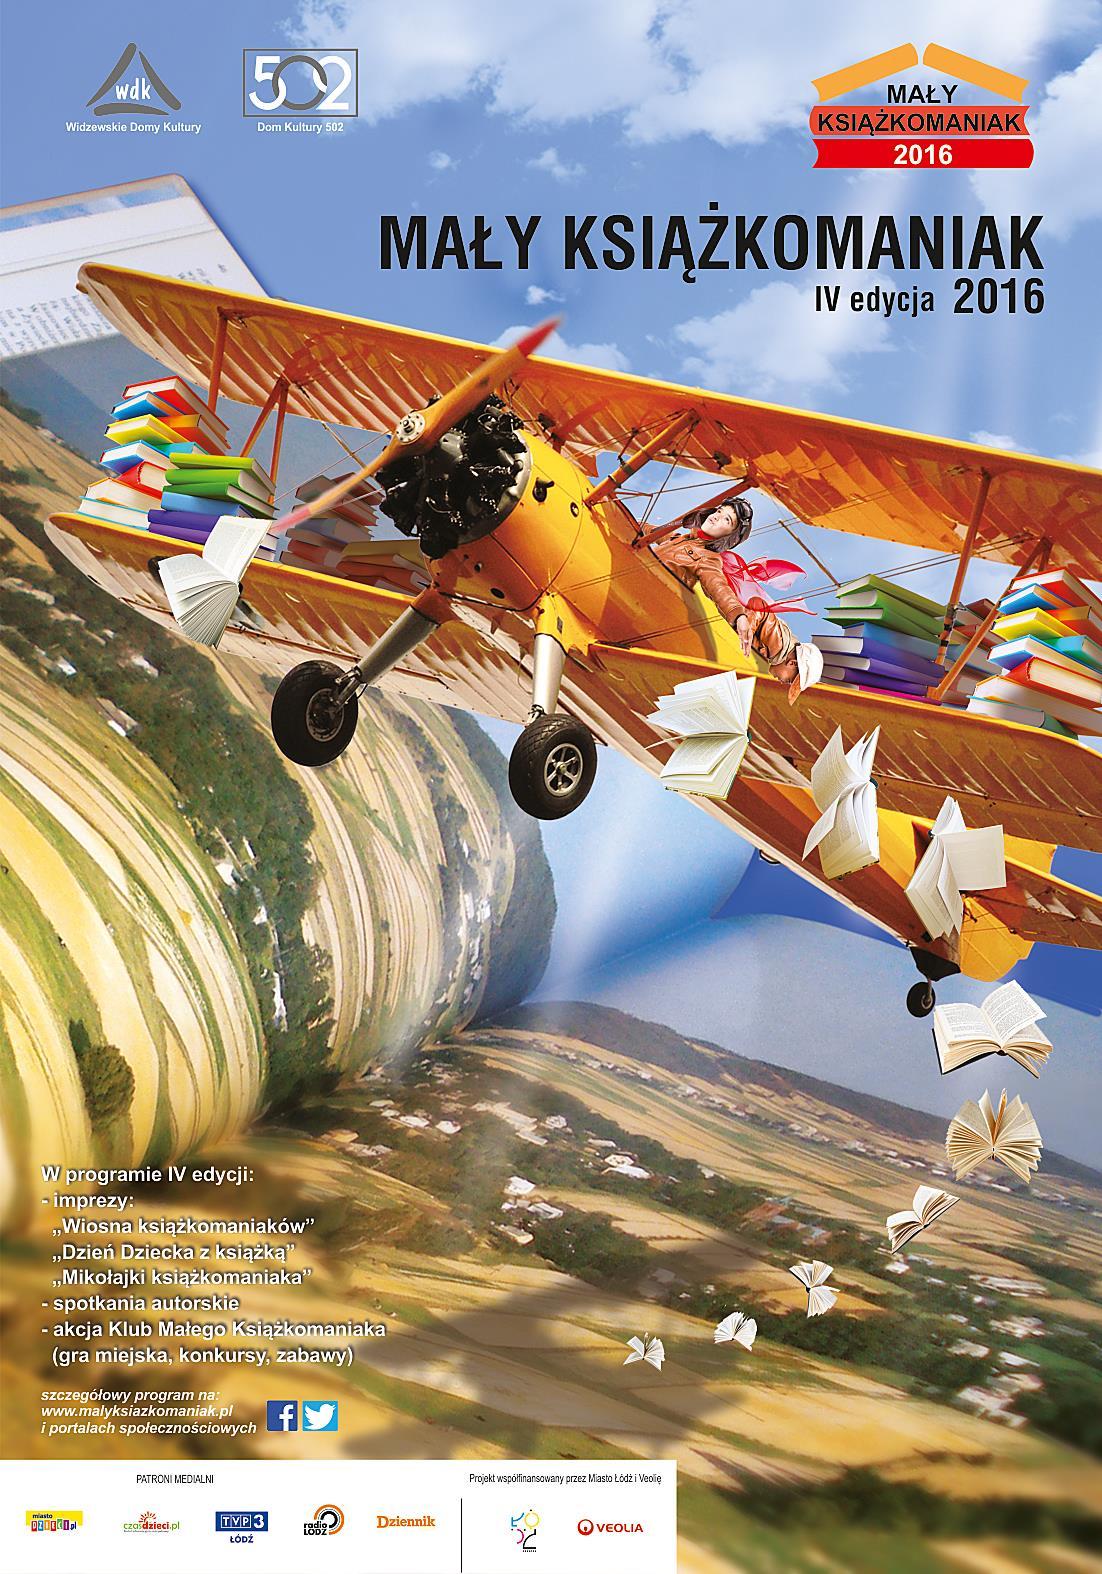 Mały książomaniak - plakat 2016